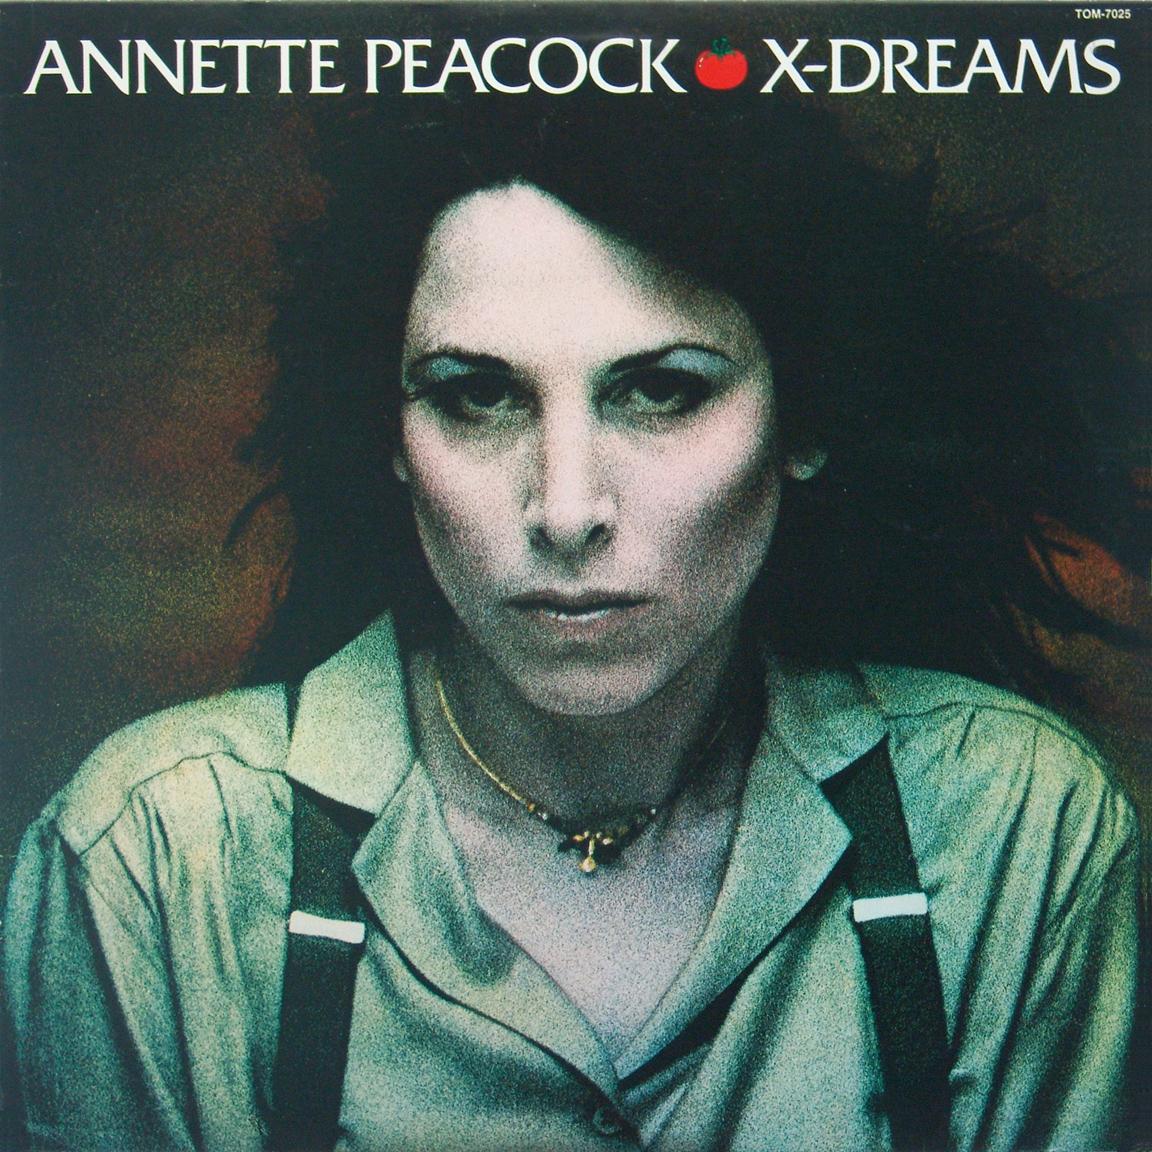 Annette Peacock — X-Dreams